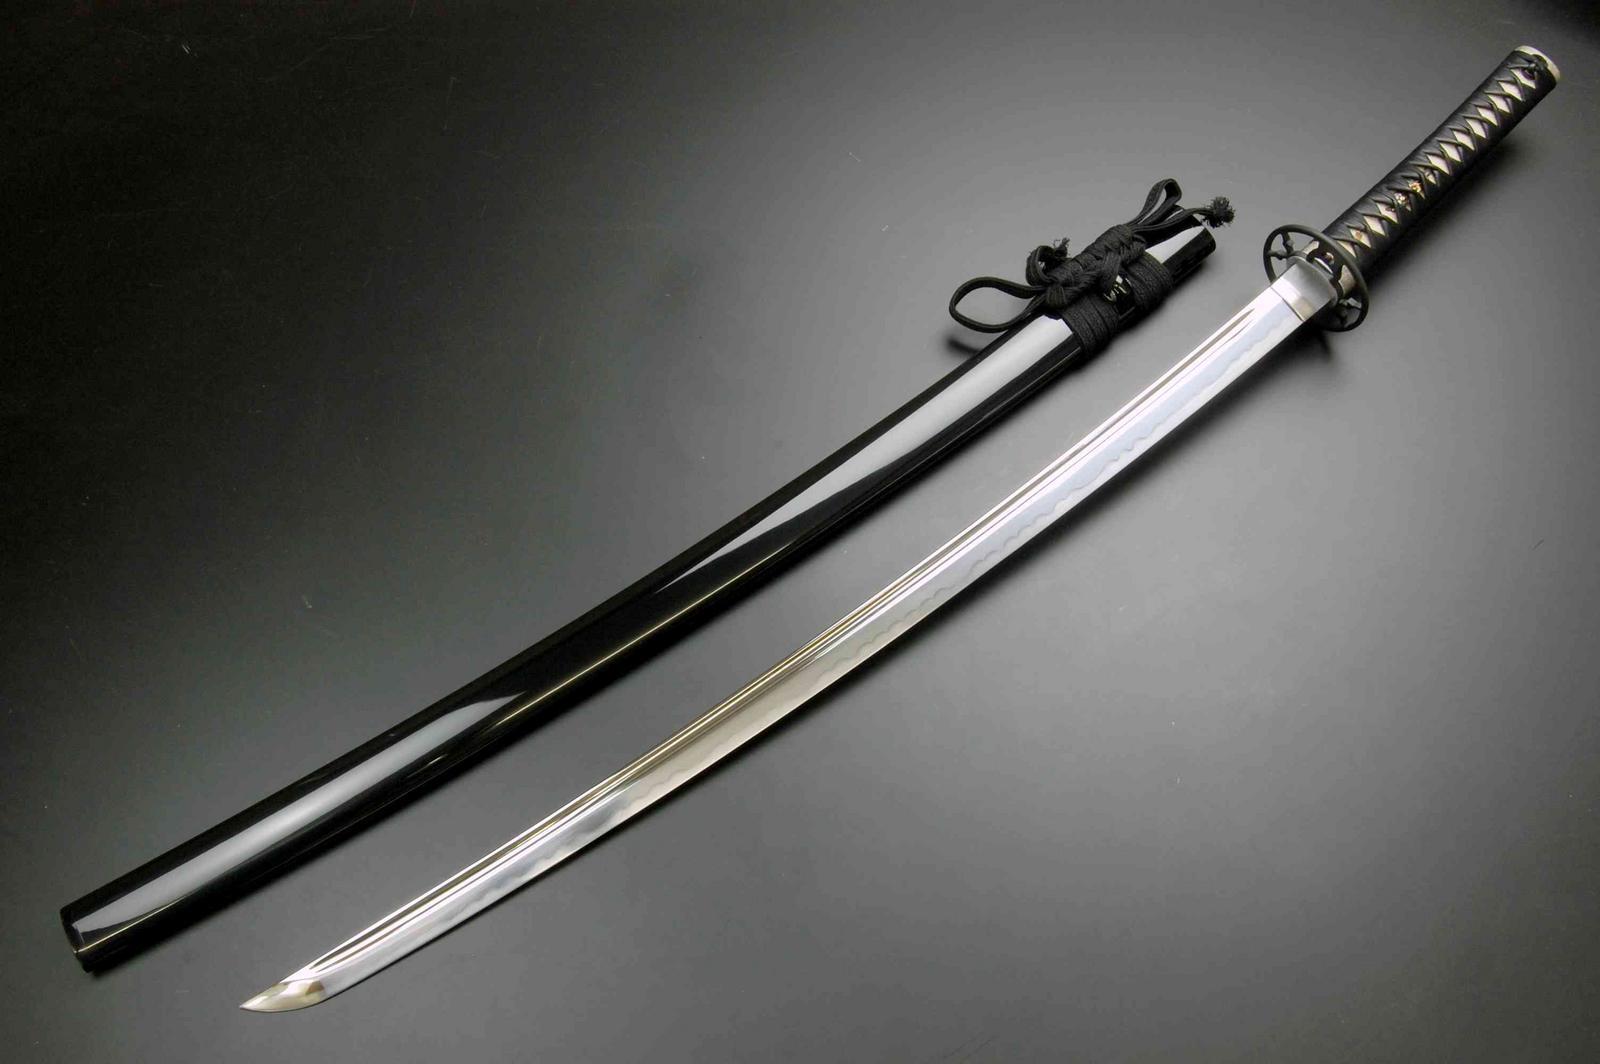 居合練習刀 時代拵え(古刀拵え)樋入大刀(J001-1)